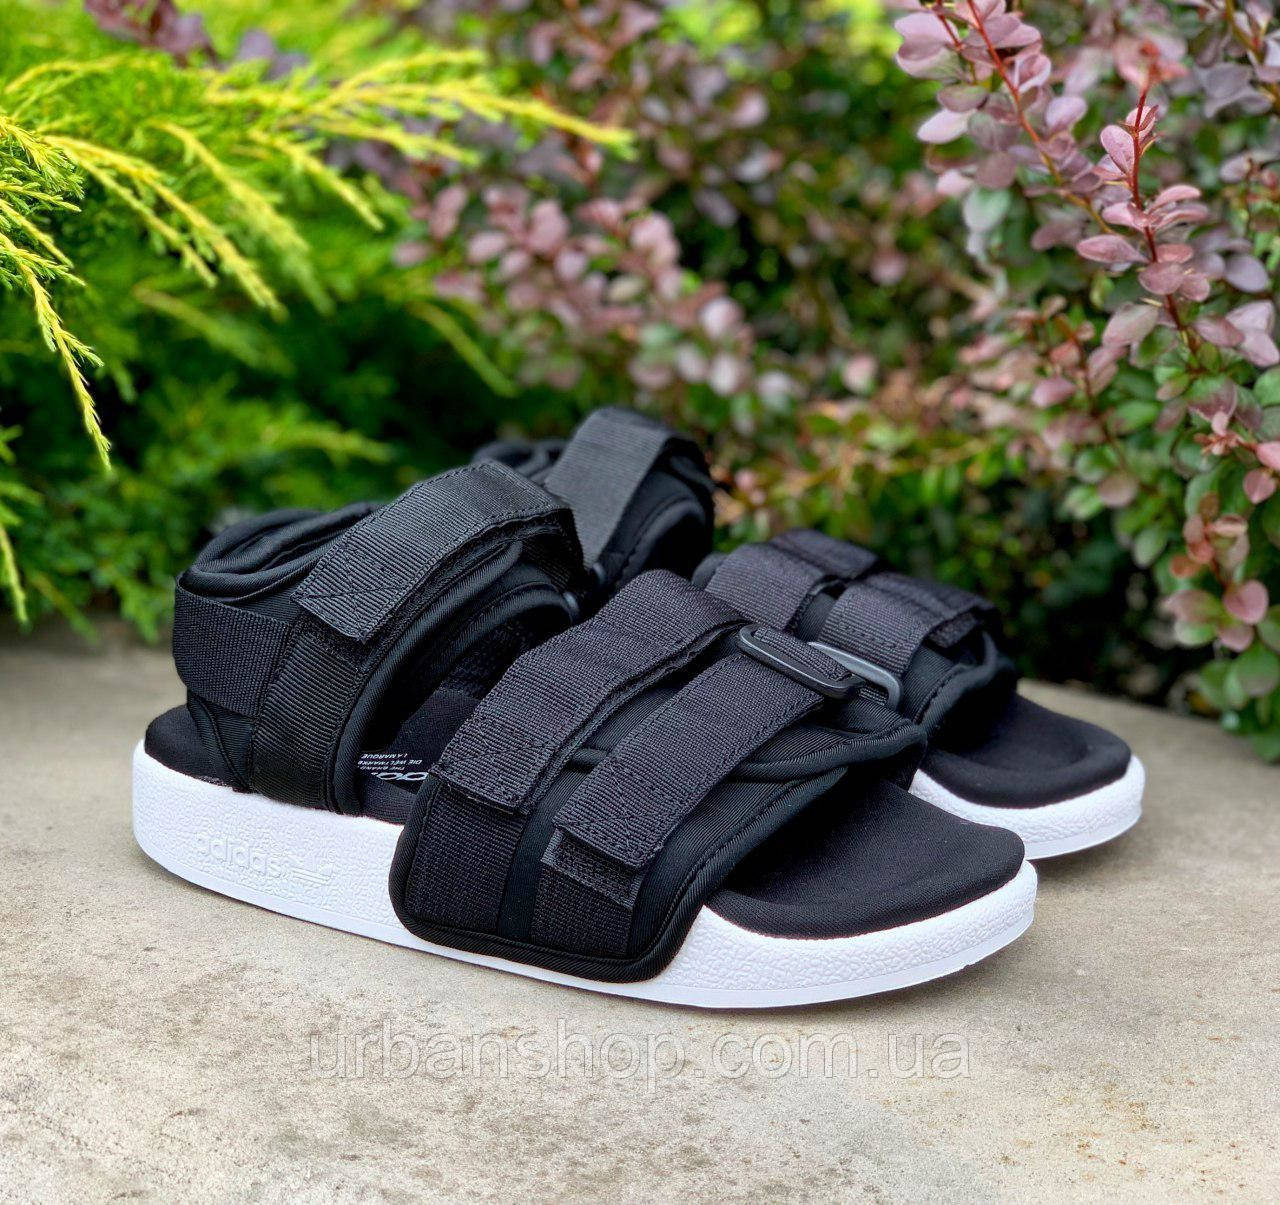 Жіночі сандалії Адідас Adidas Adilette Black. ТОП Репліка ААА класу.